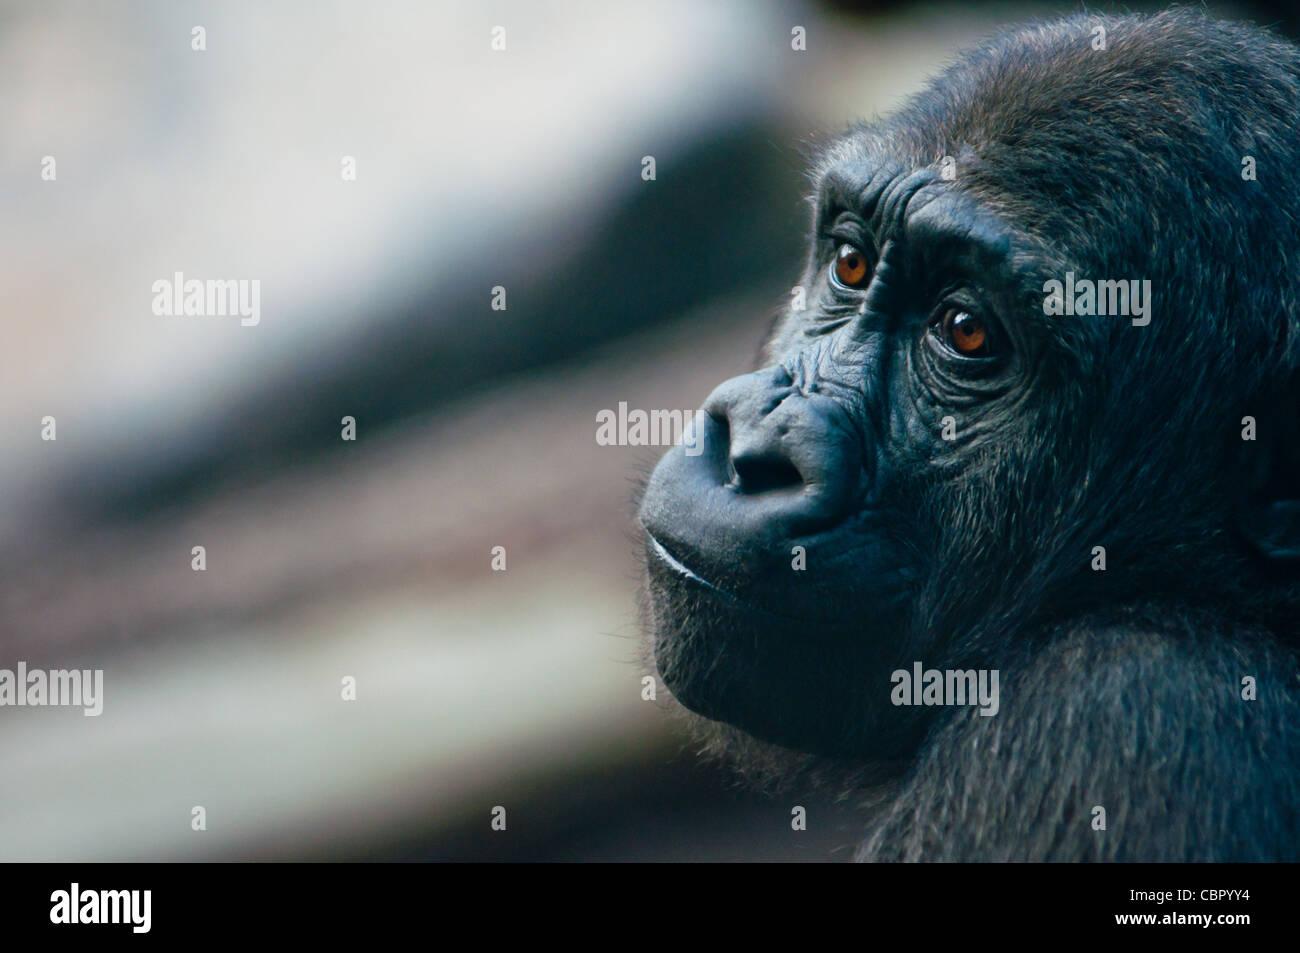 Western lowland Gorilla looking rather melancholy. - Stock Image